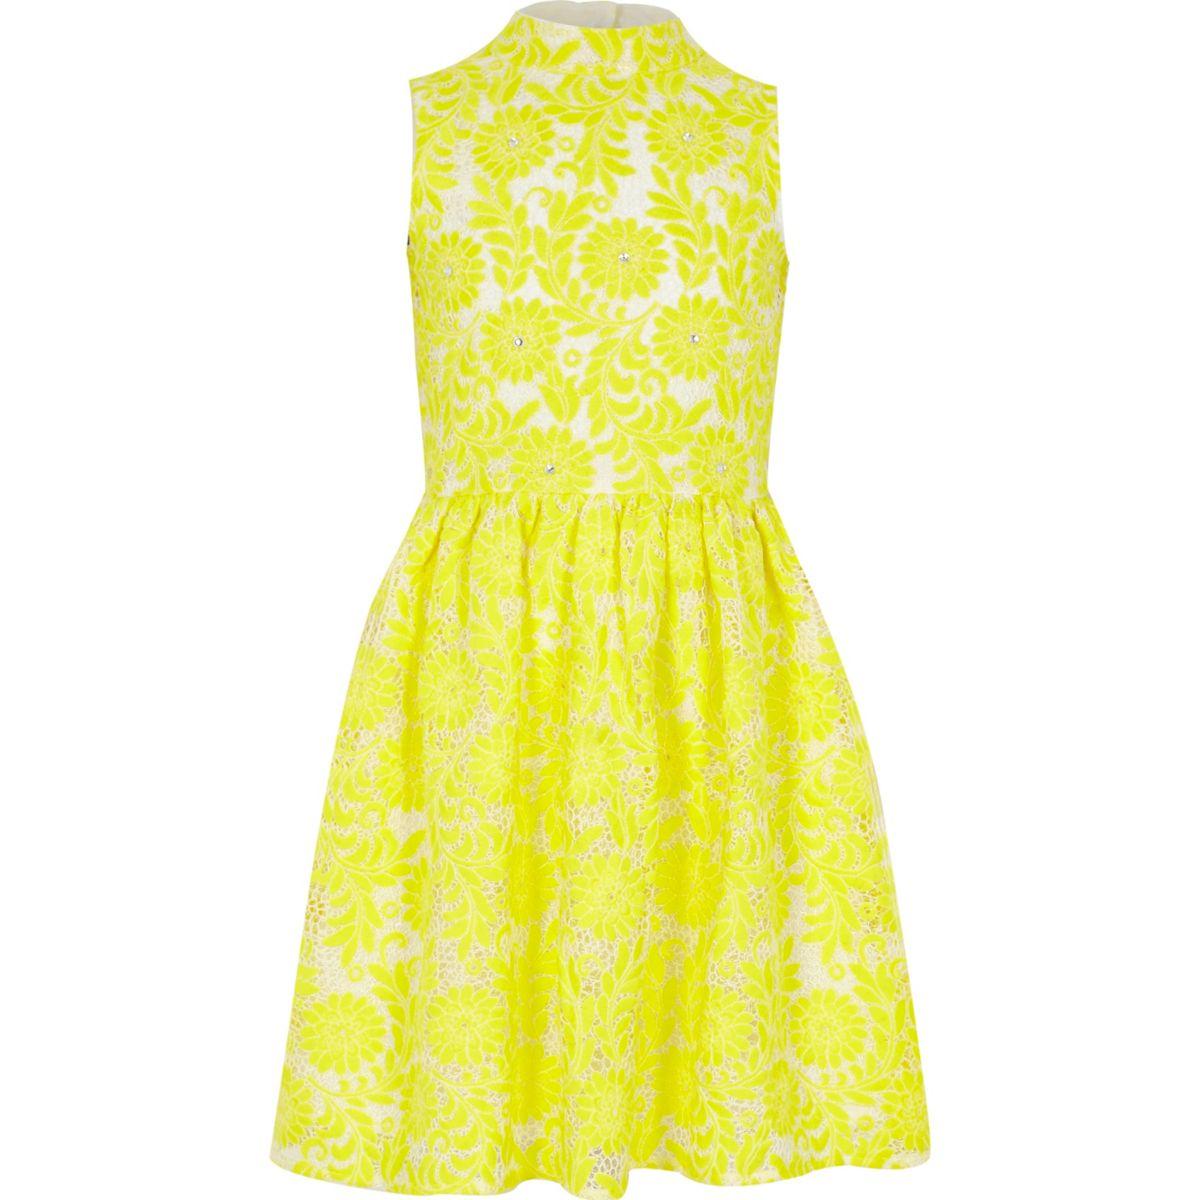 Girls yellow lace high neck prom dress